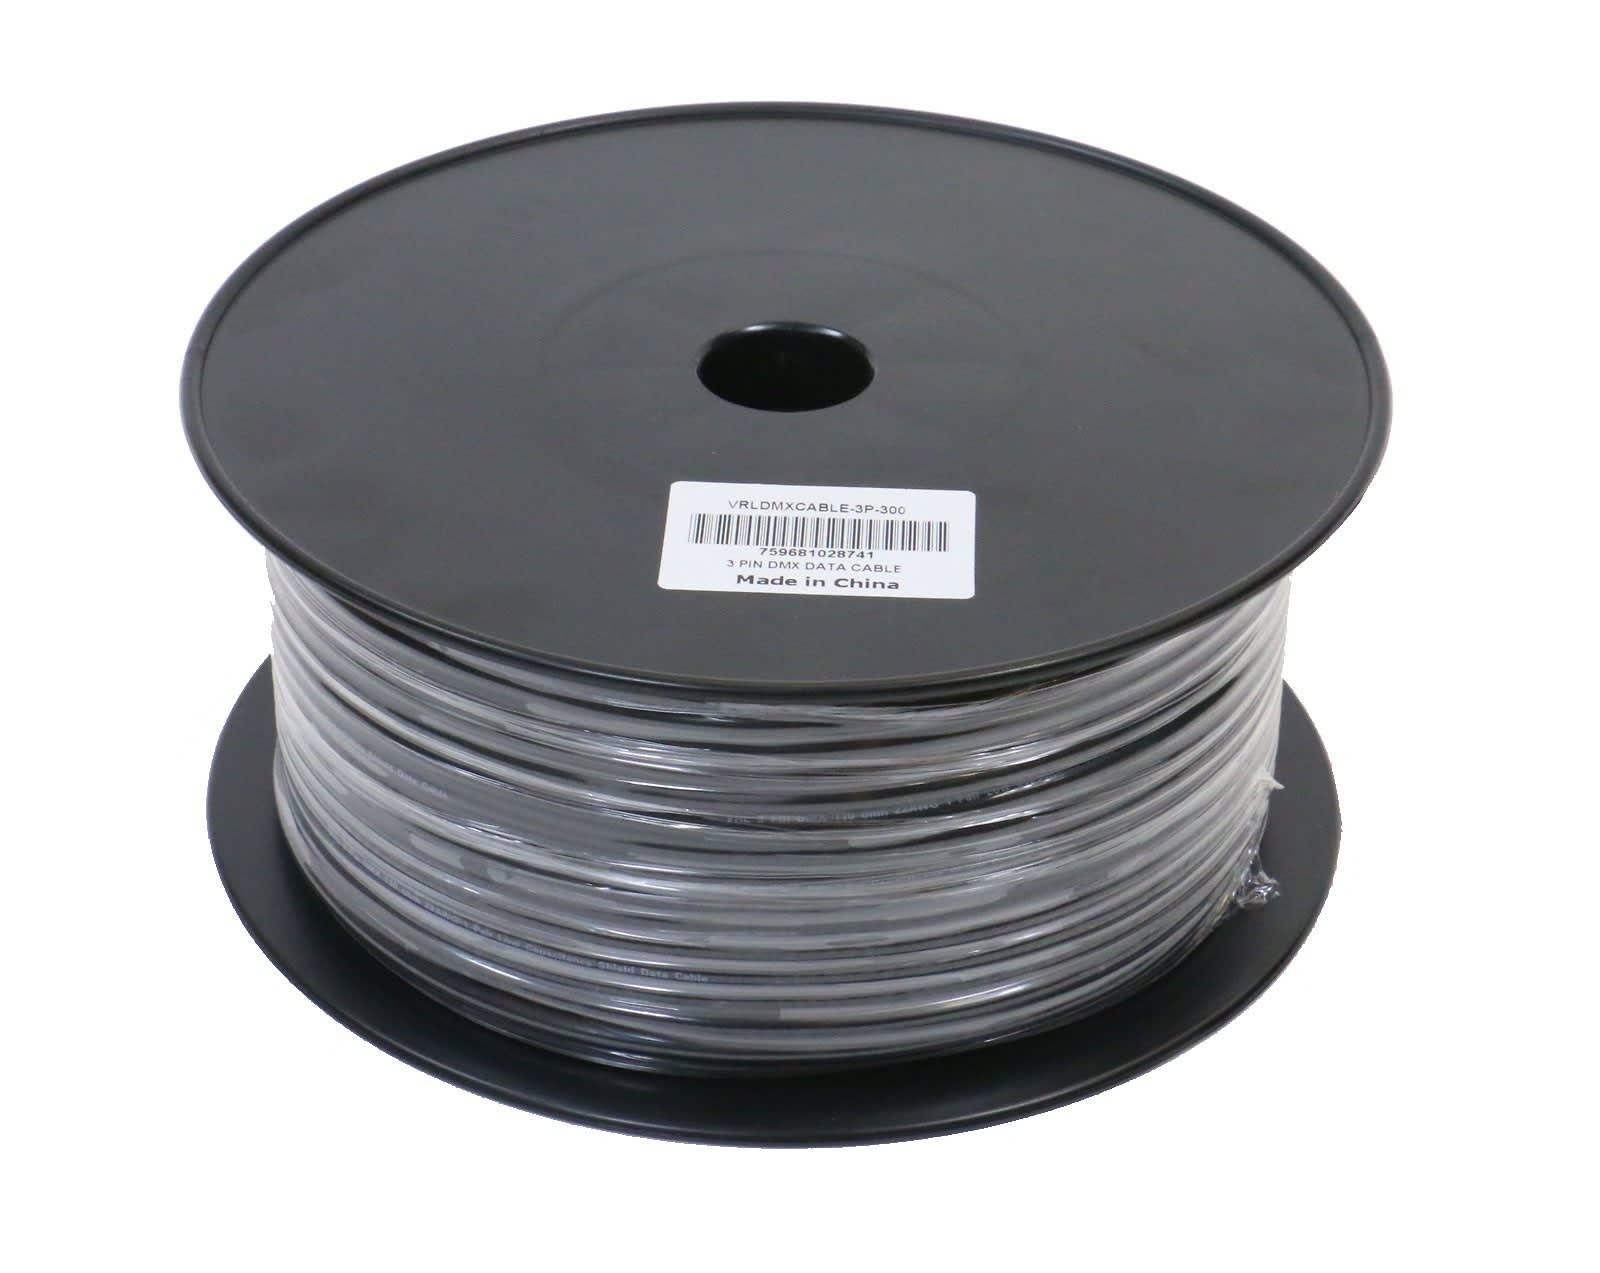 VRL VRLDMXCABLE-5P-300 5 Pin DMX Cable 300' Bulk Spool